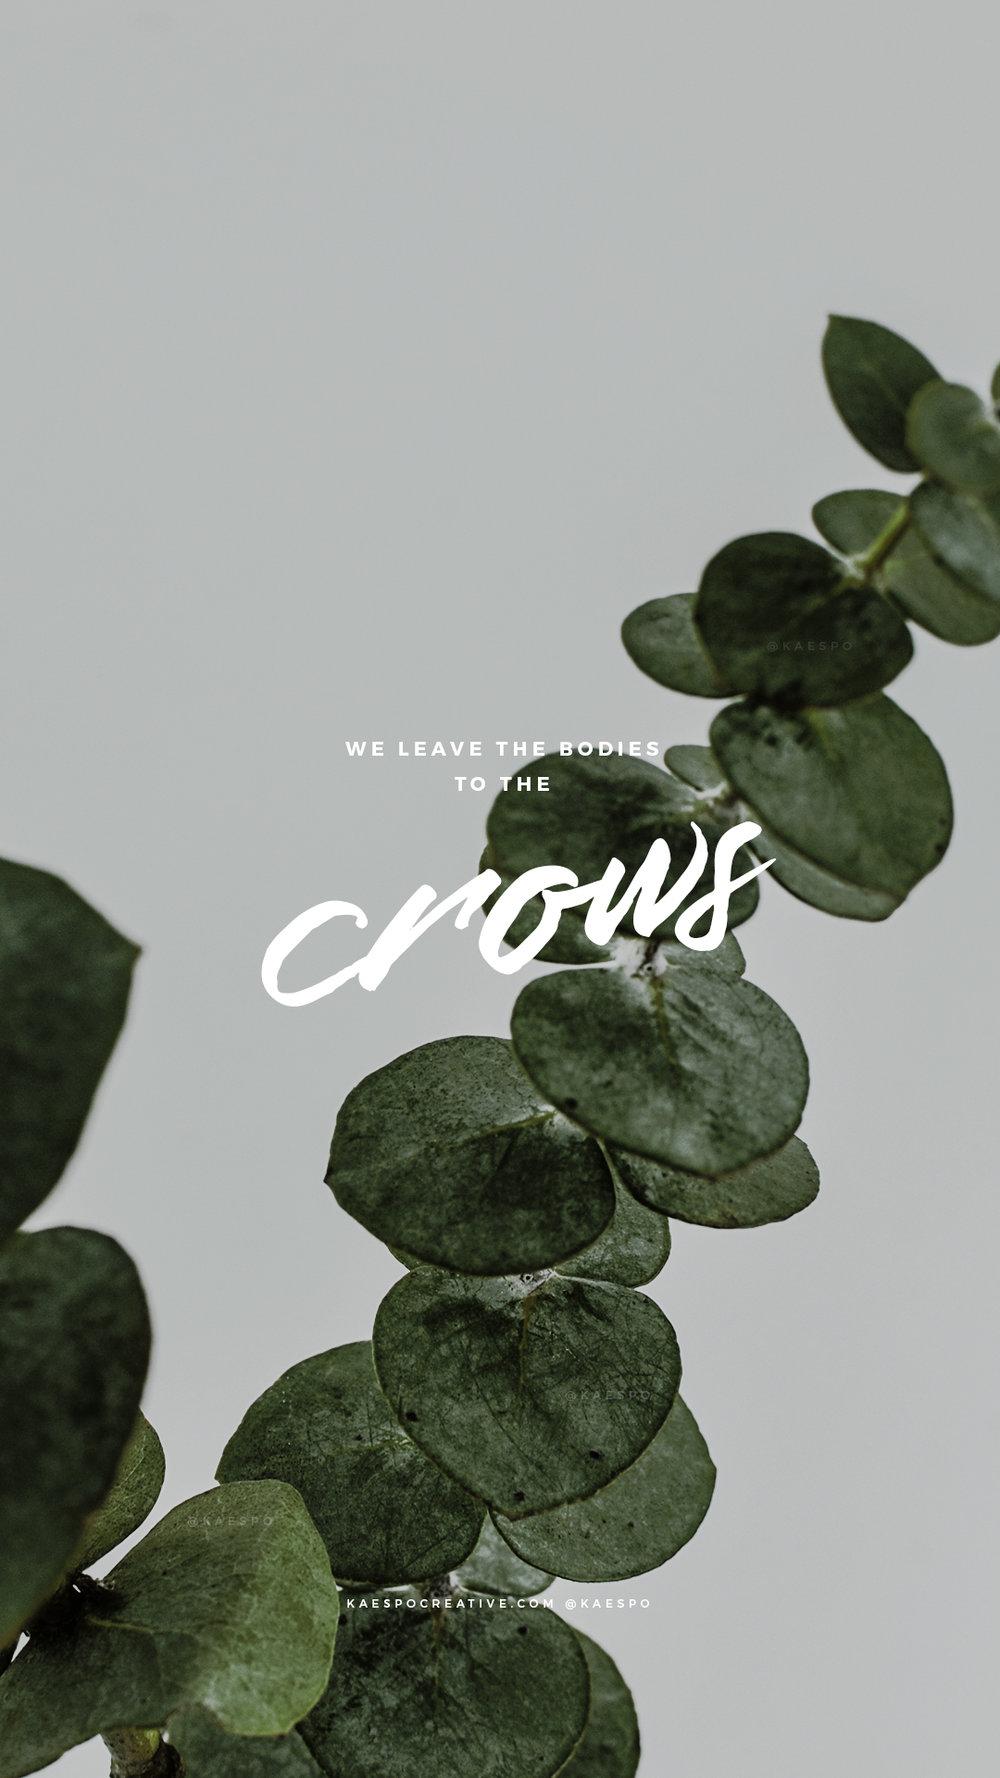 Banners Lyrics and Artwork | KAESPO Design & Creative Lifestyle Blog